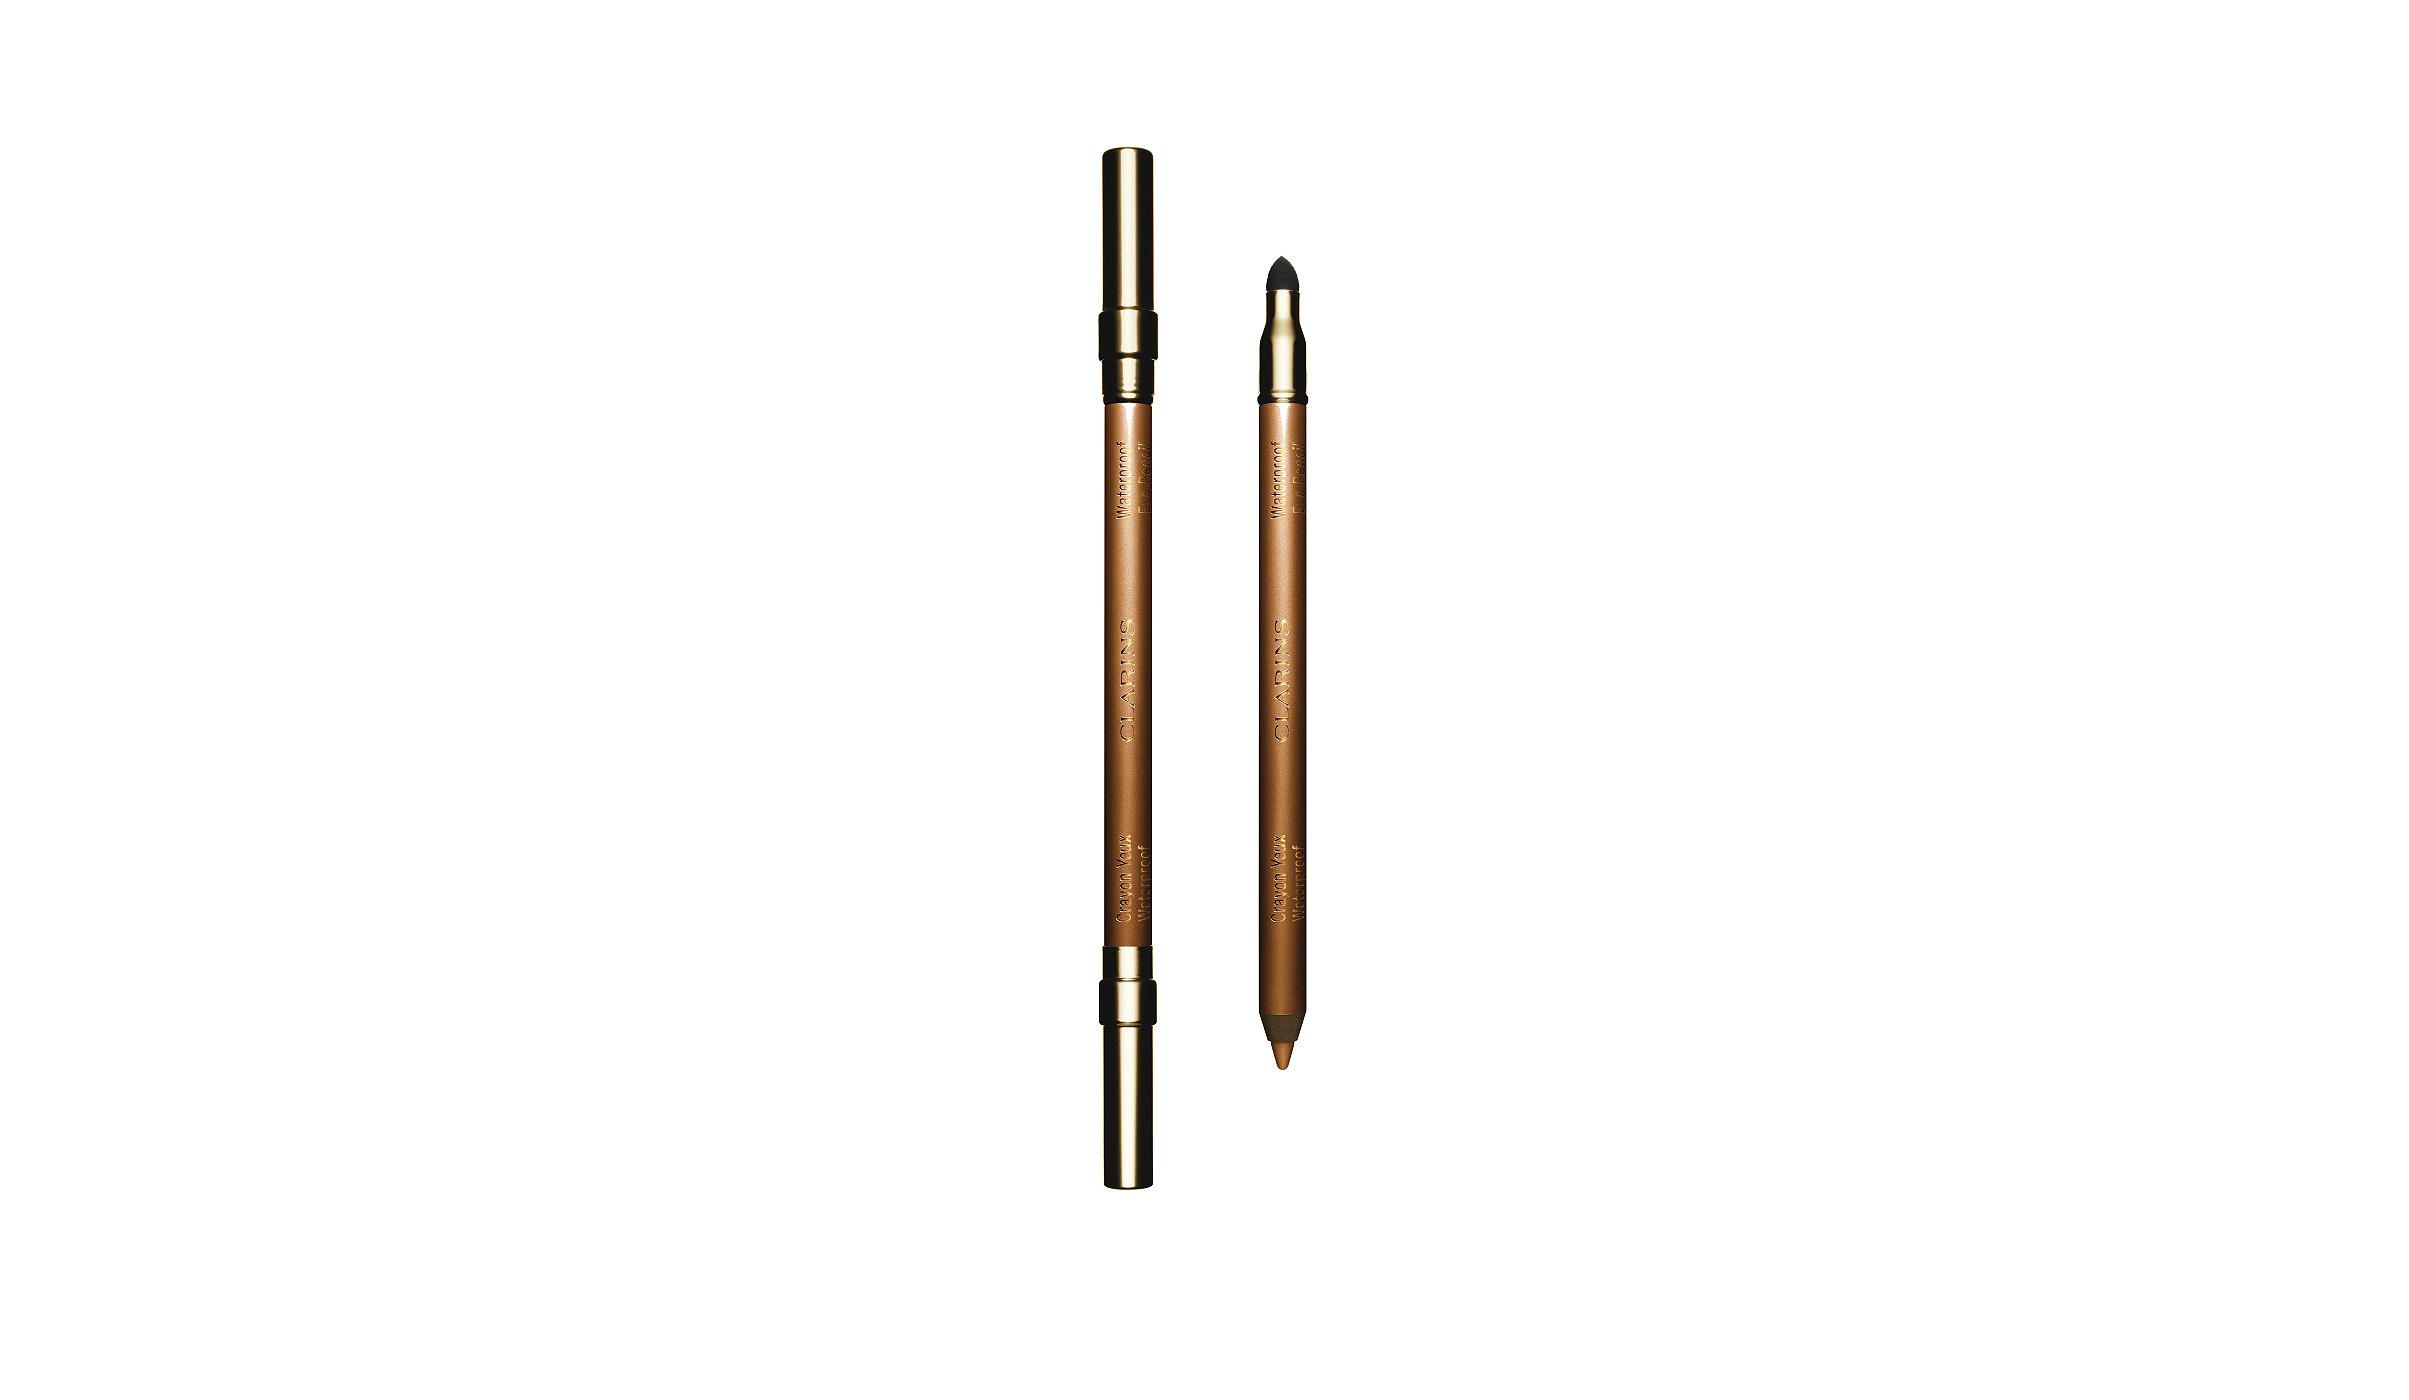 NEW Clarins Eye Pencil Waterproof - 07, Copper